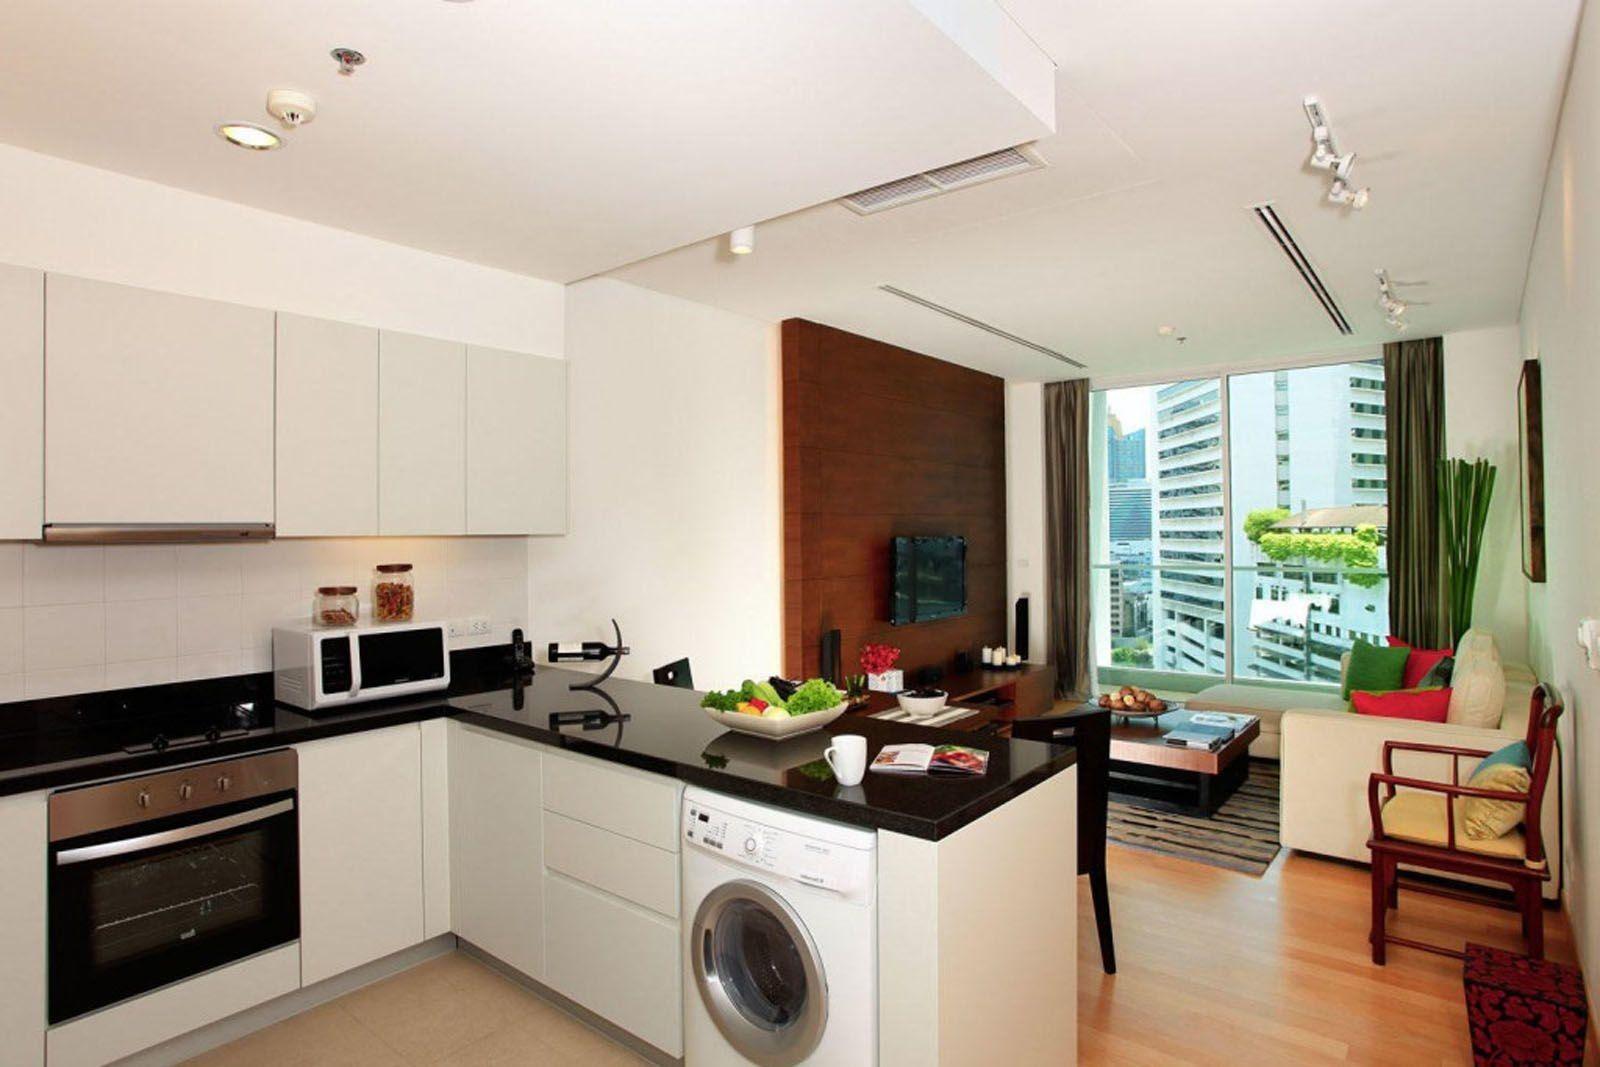 . Simple Kitchen And Living Room Design   Kitchen Design Ideas